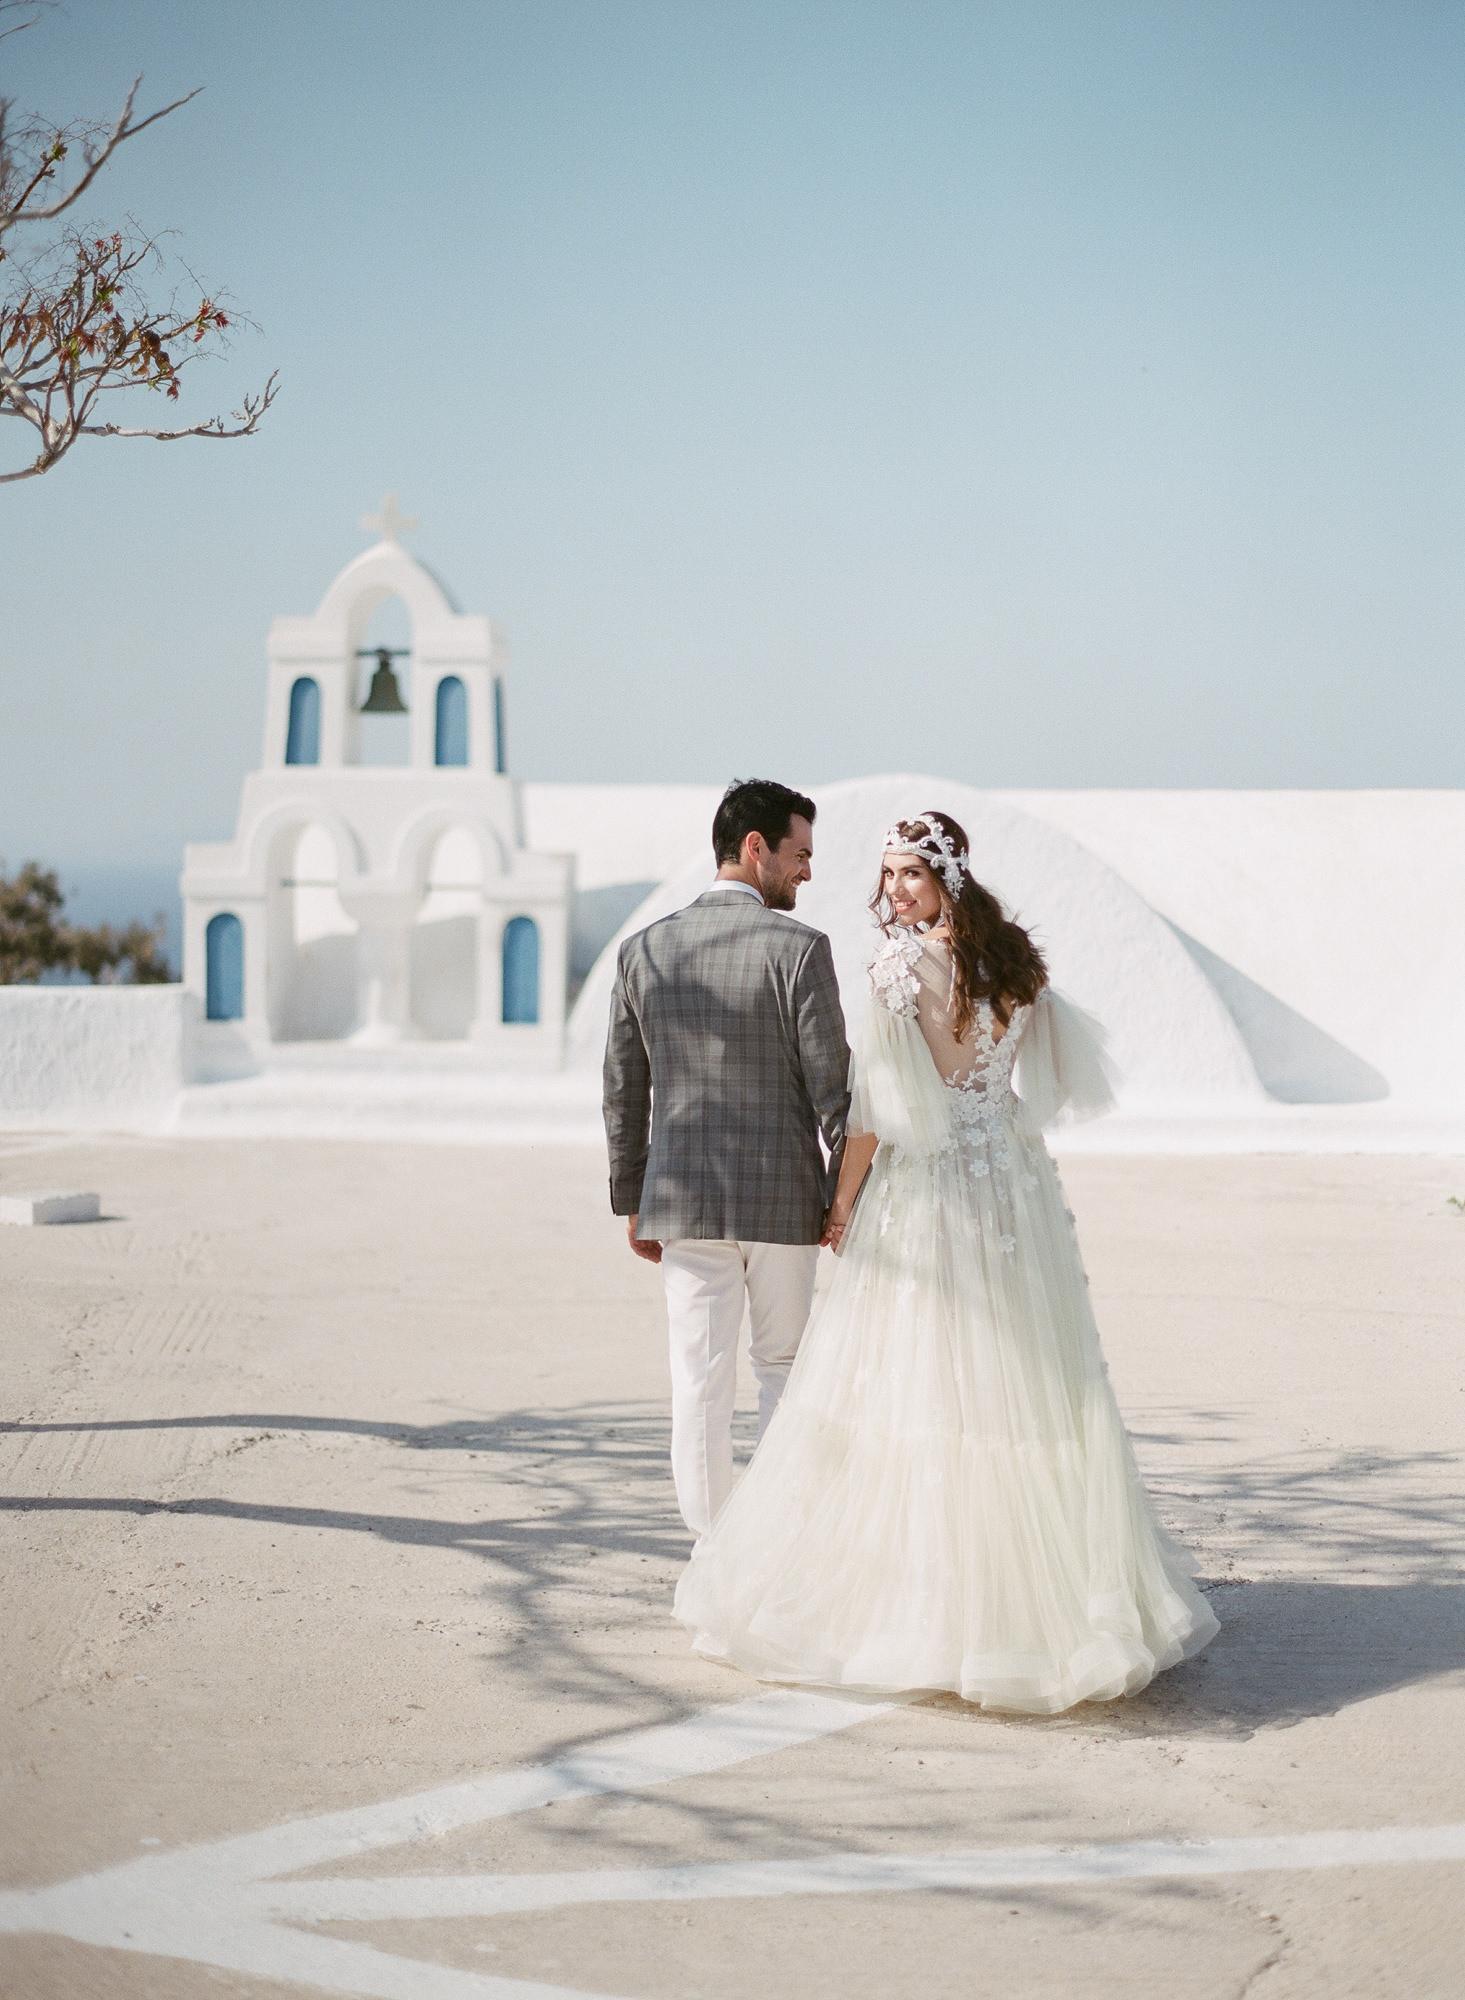 Couple walking to white stucco church - photo by Gianluca Adoviaso Photography